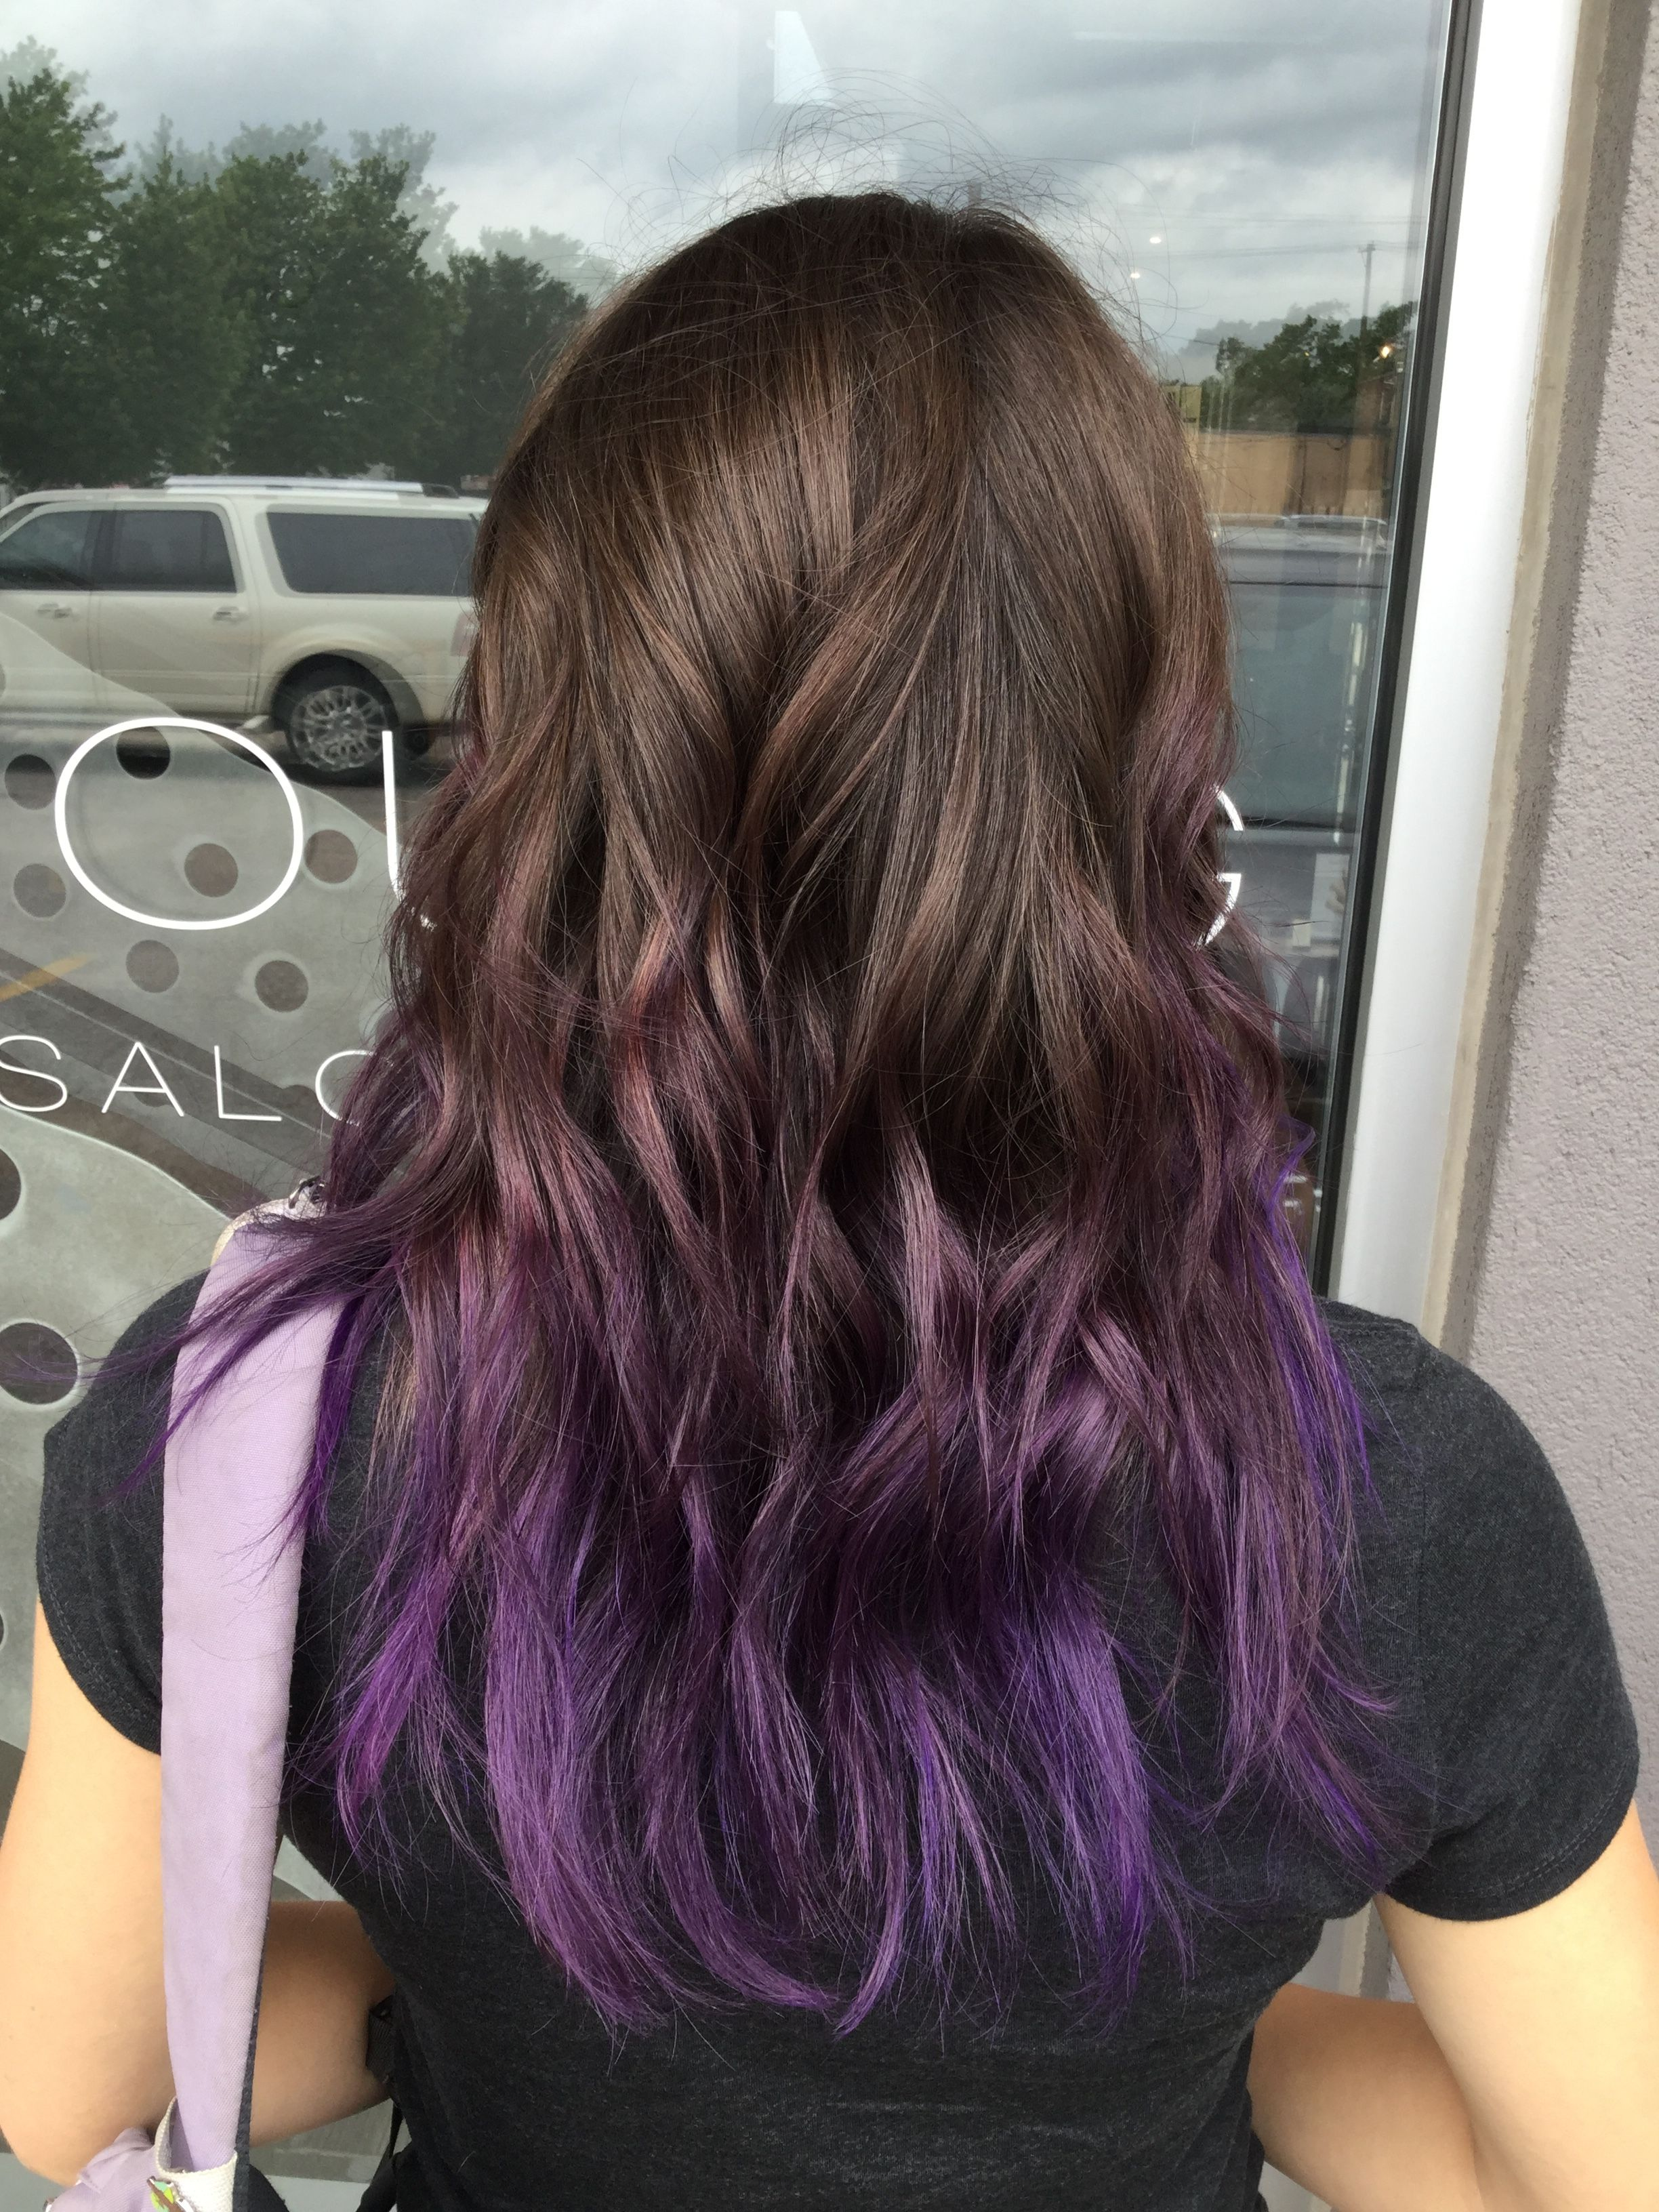 Purple Balayage Hair Purple Hair Color Tips Purple Ombre Purple Hair Tips Balayage Hair Purple Colored Hair Tips